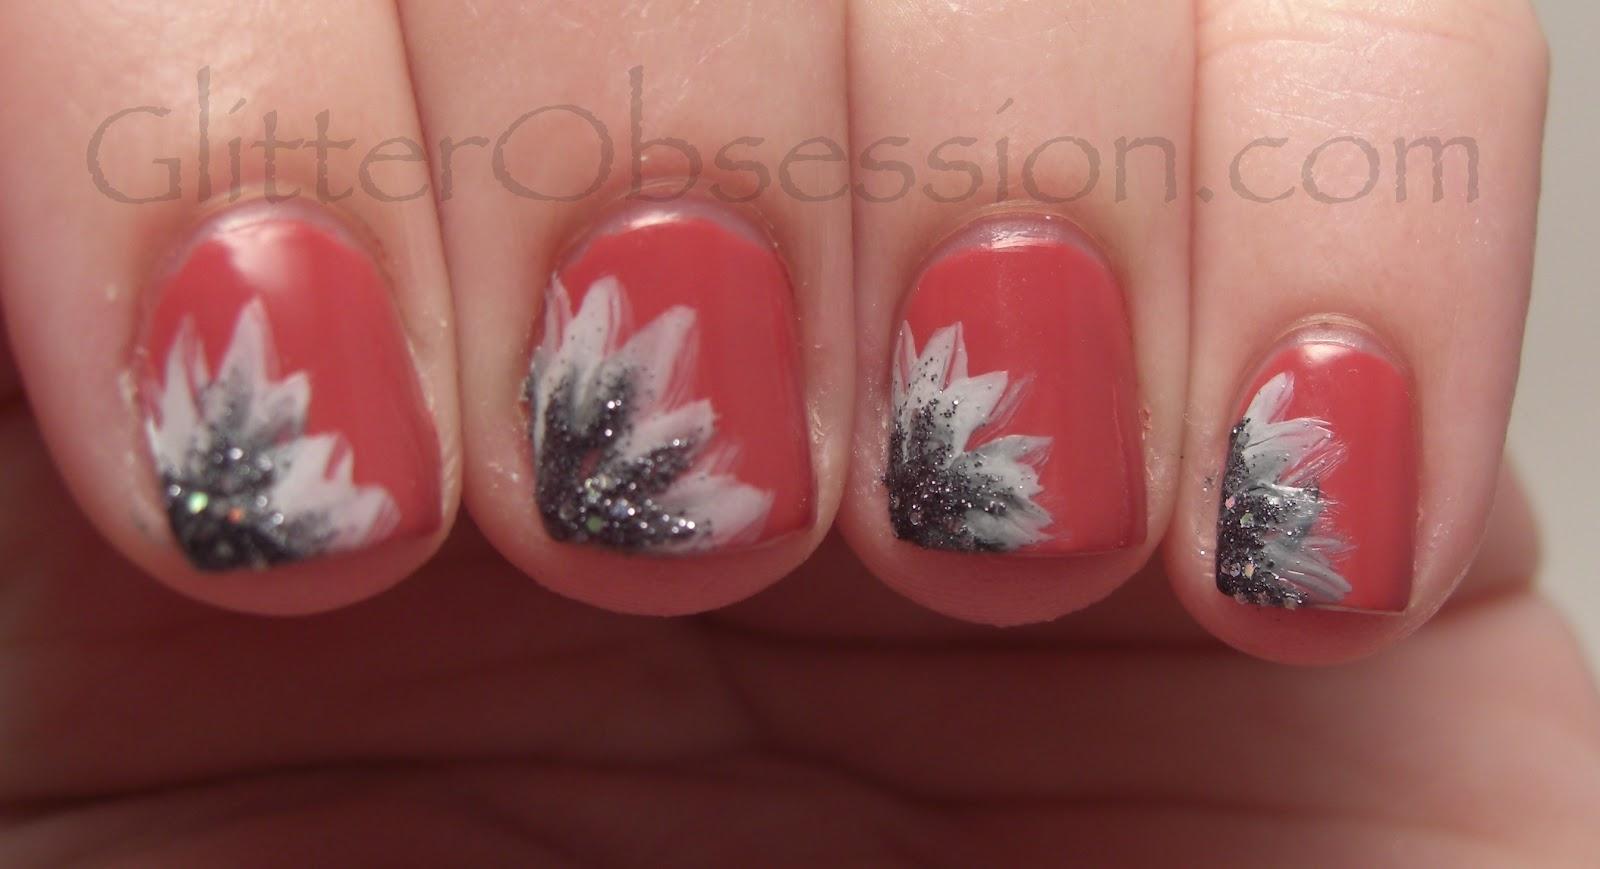 Glitter Obsession White And Black Heart Flower Nail Art